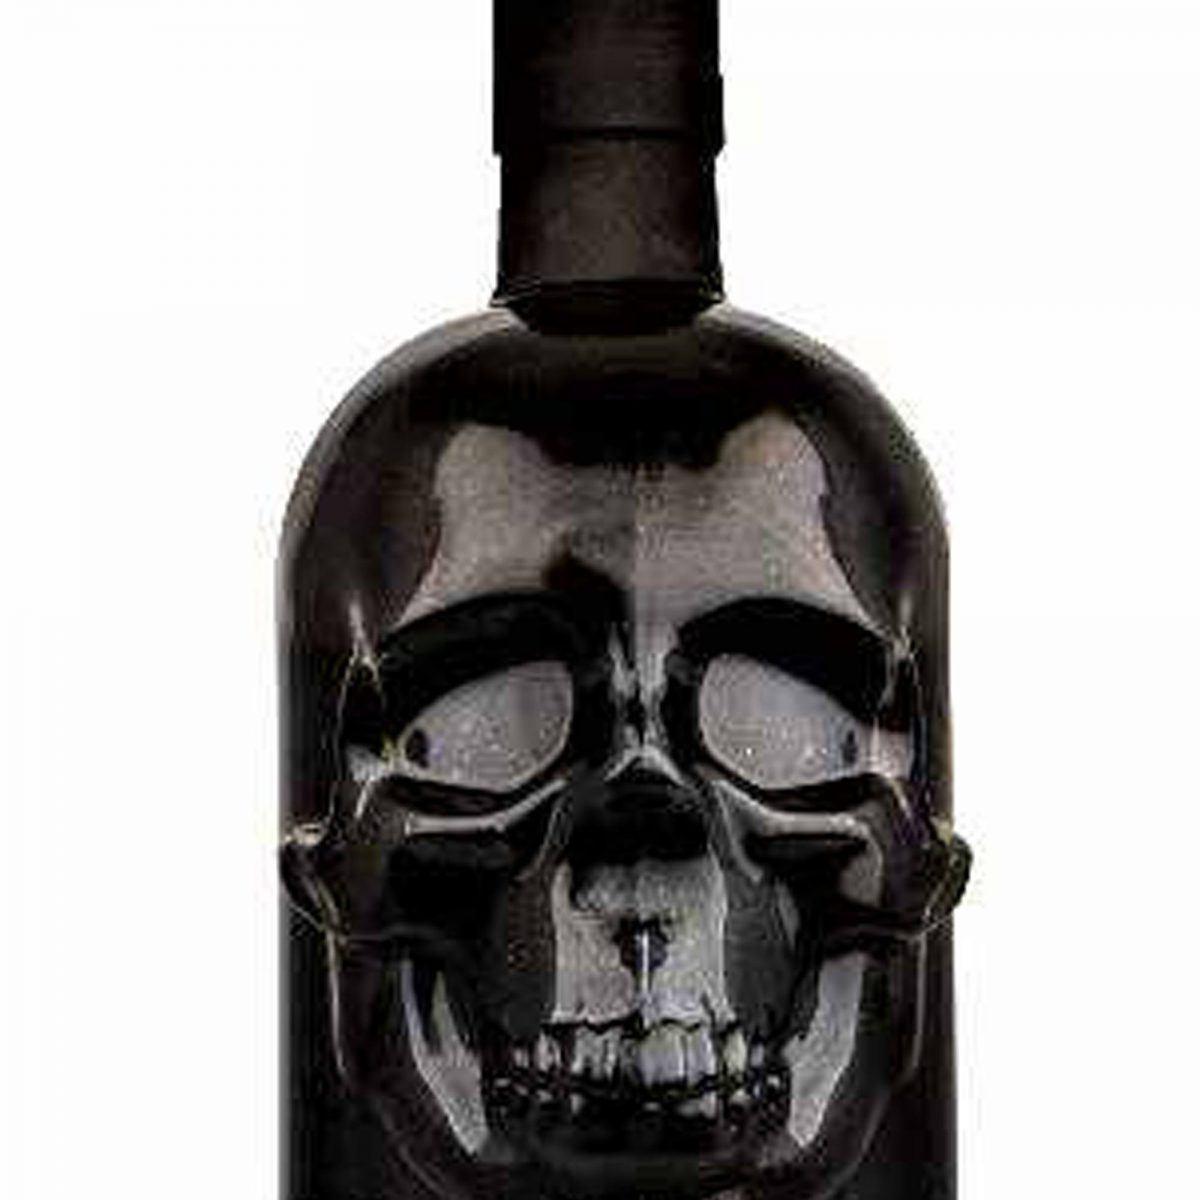 Saus.Guru hot saus - Black Gold Skull Bottle